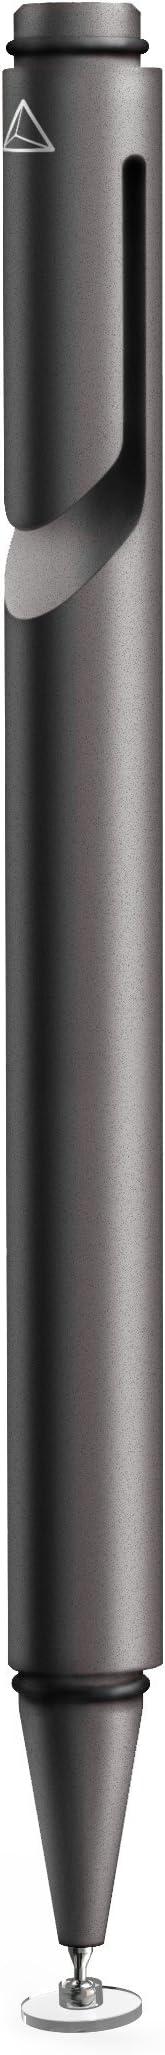 Adonit ADJM3B Mini 3 Fine Point Precision Stylus Black